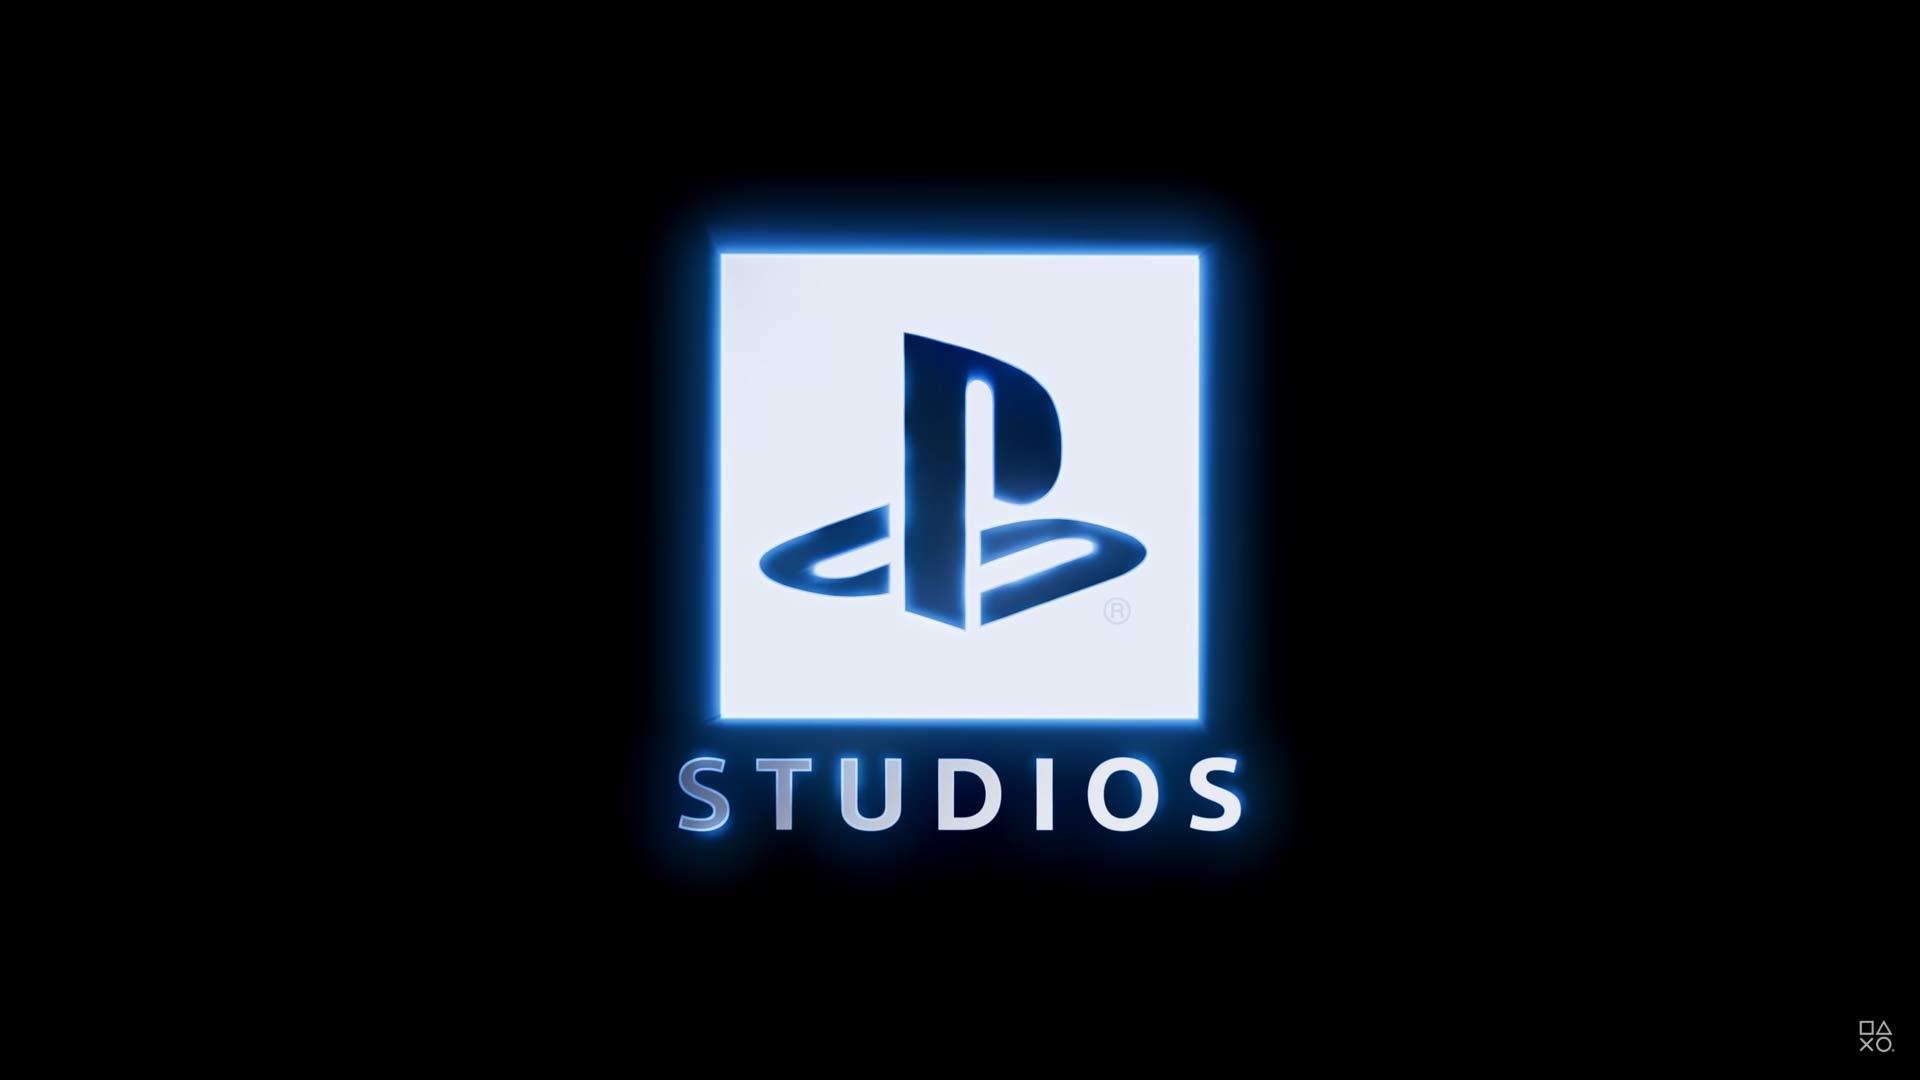 PS5 PlayStation Studios